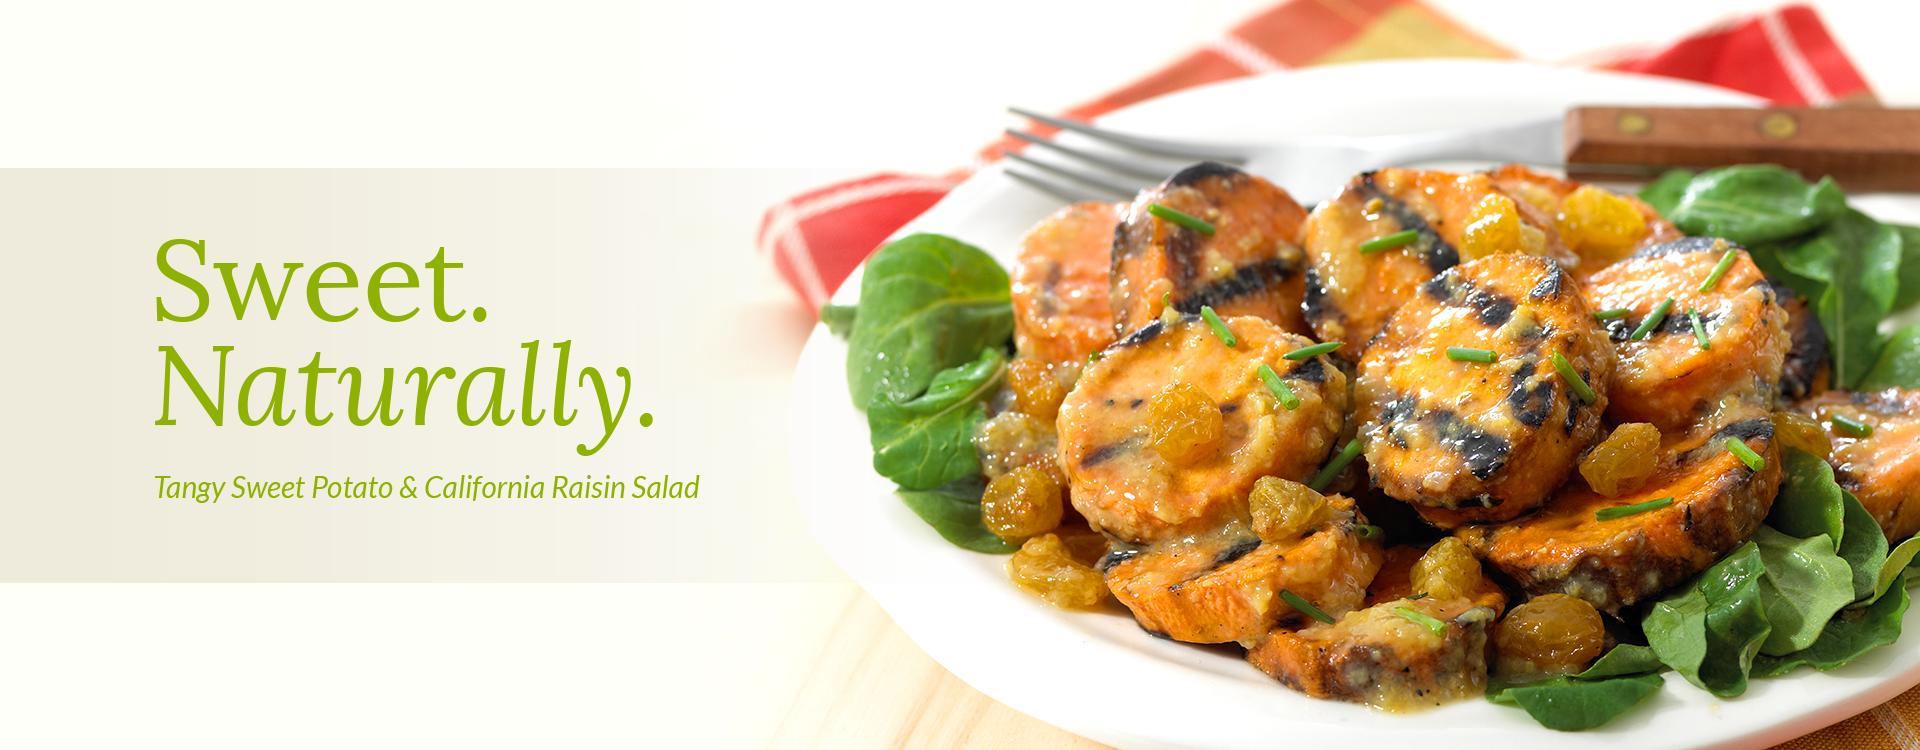 Tangy Sweet Potato and California Raisin Salad